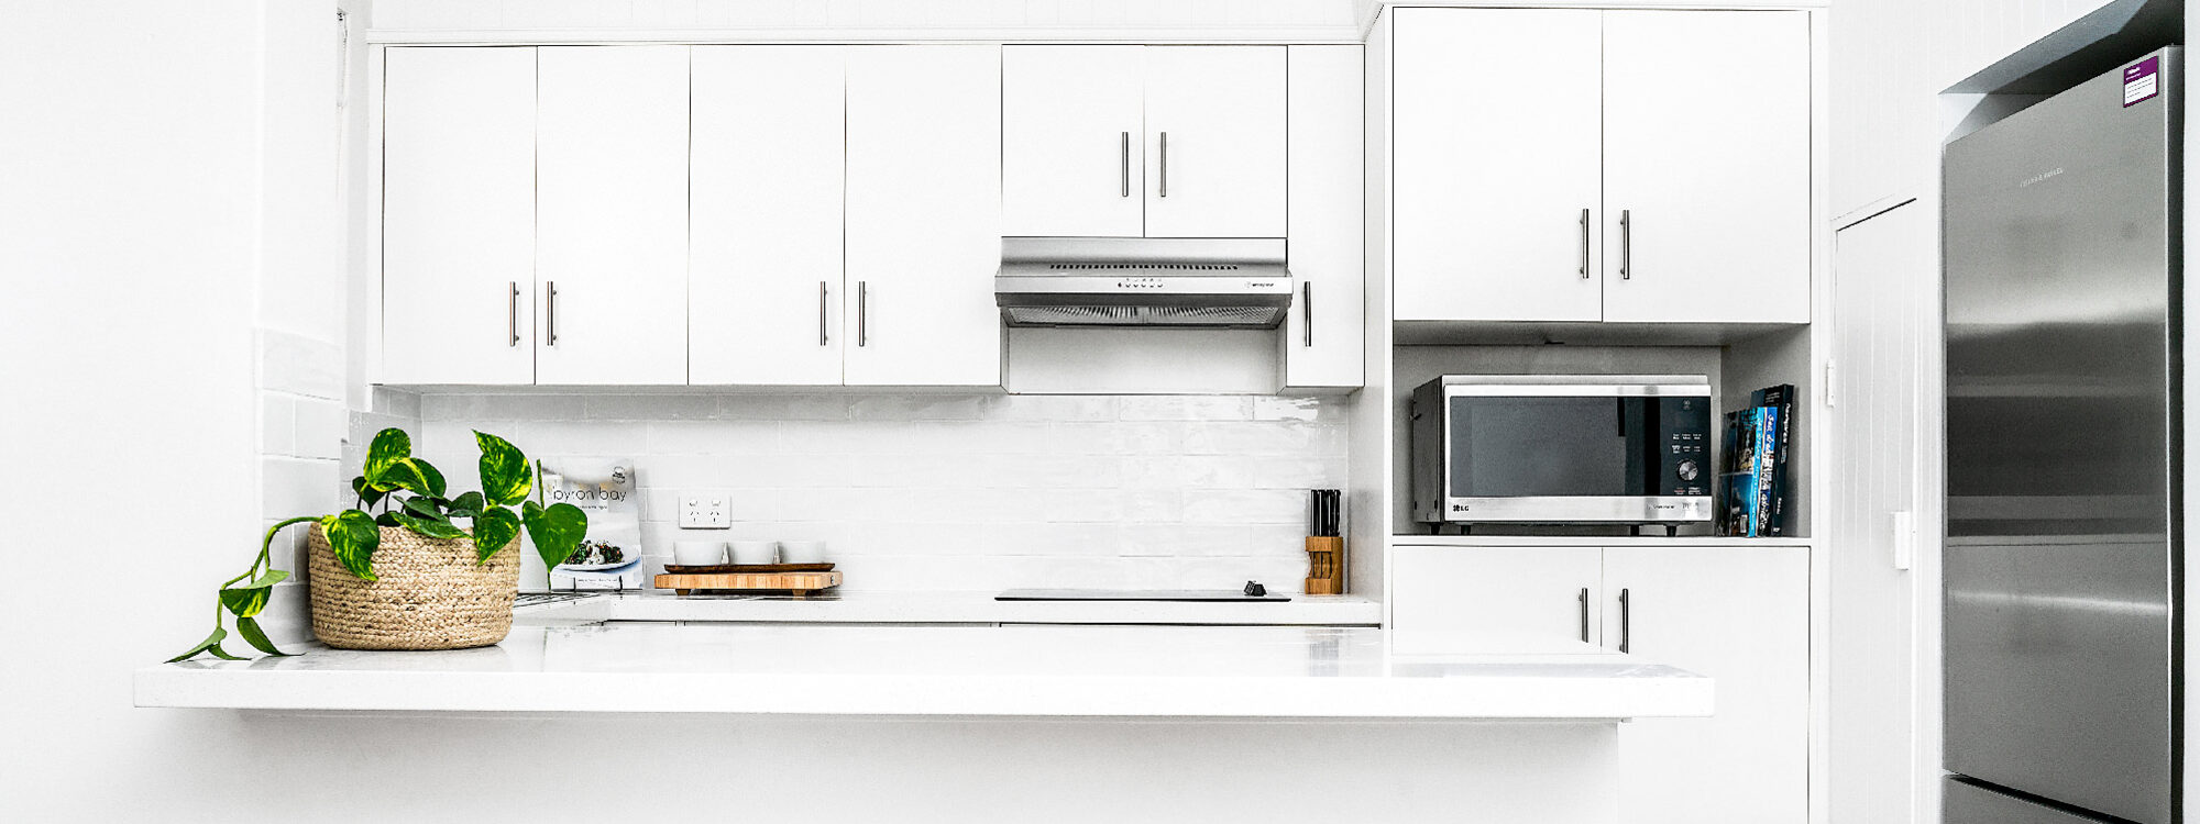 Cooinda - Byron Bay - Kitchen b